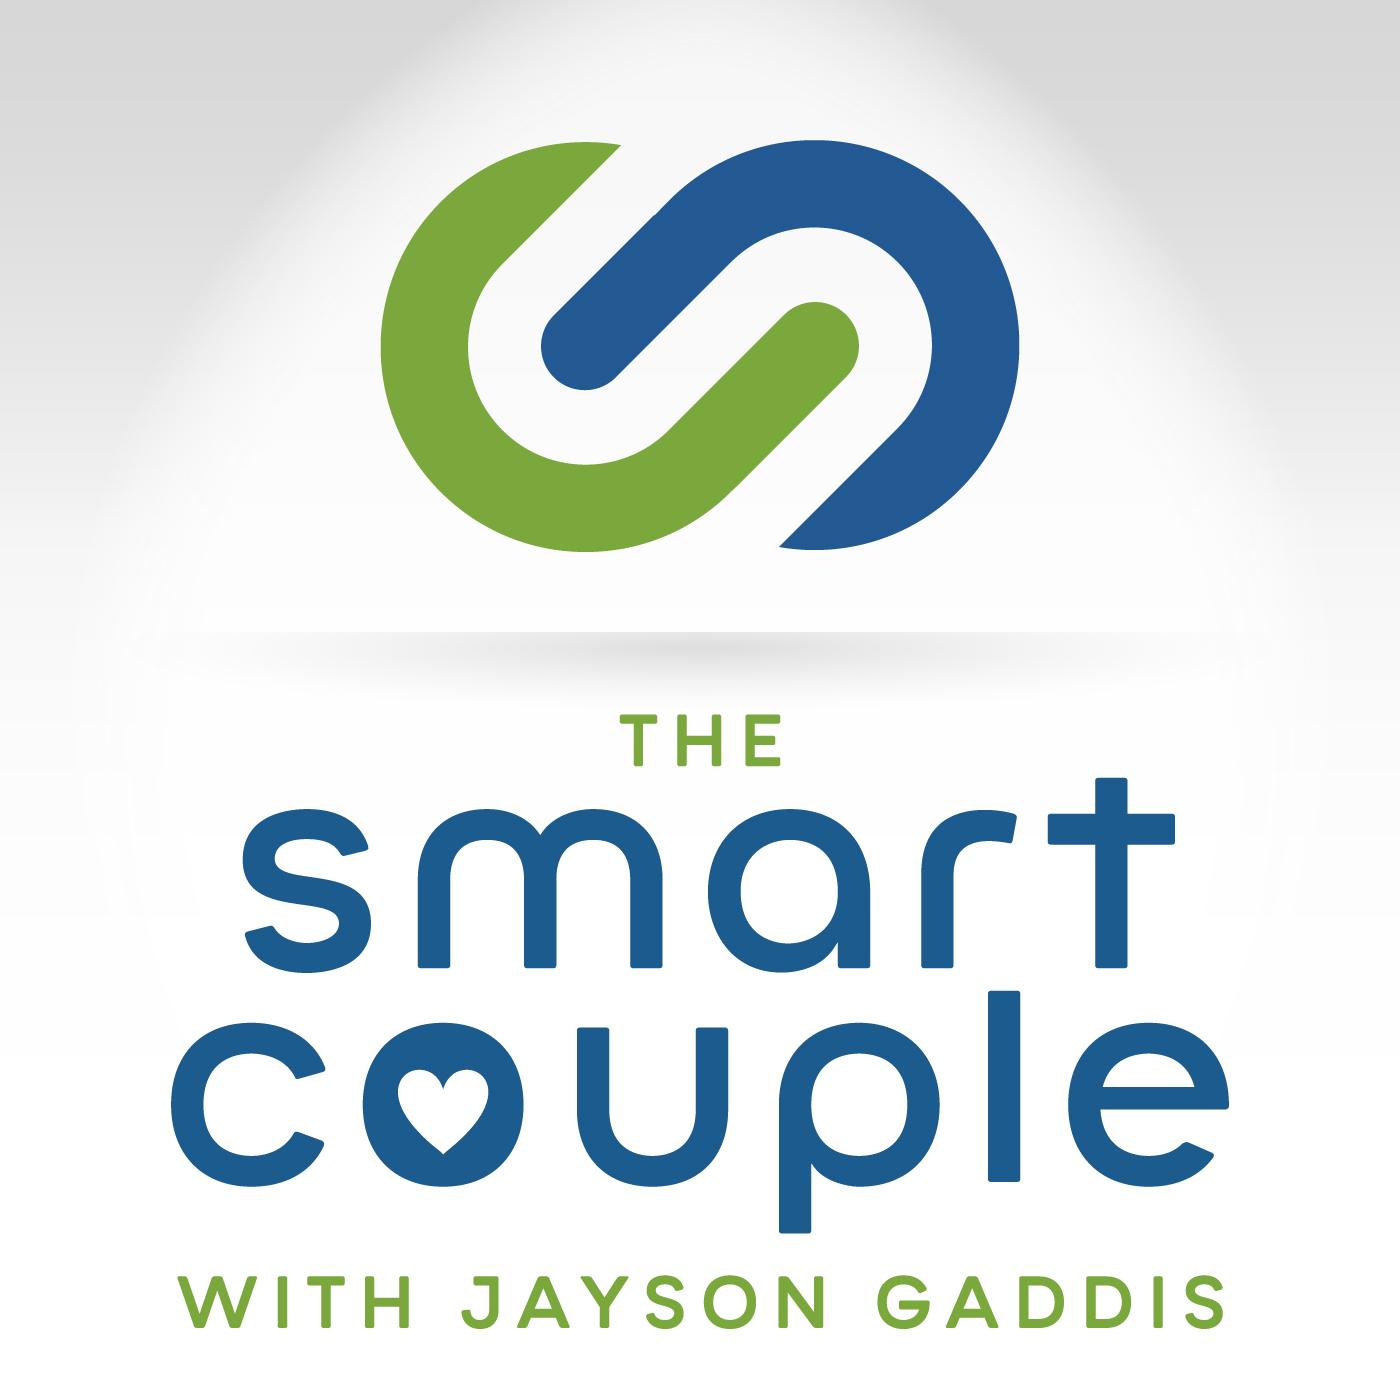 The Relationship School Podcast - SC 176 - Why Spiritually Developed People Struggle With Monogamy - Ellen & Jayson